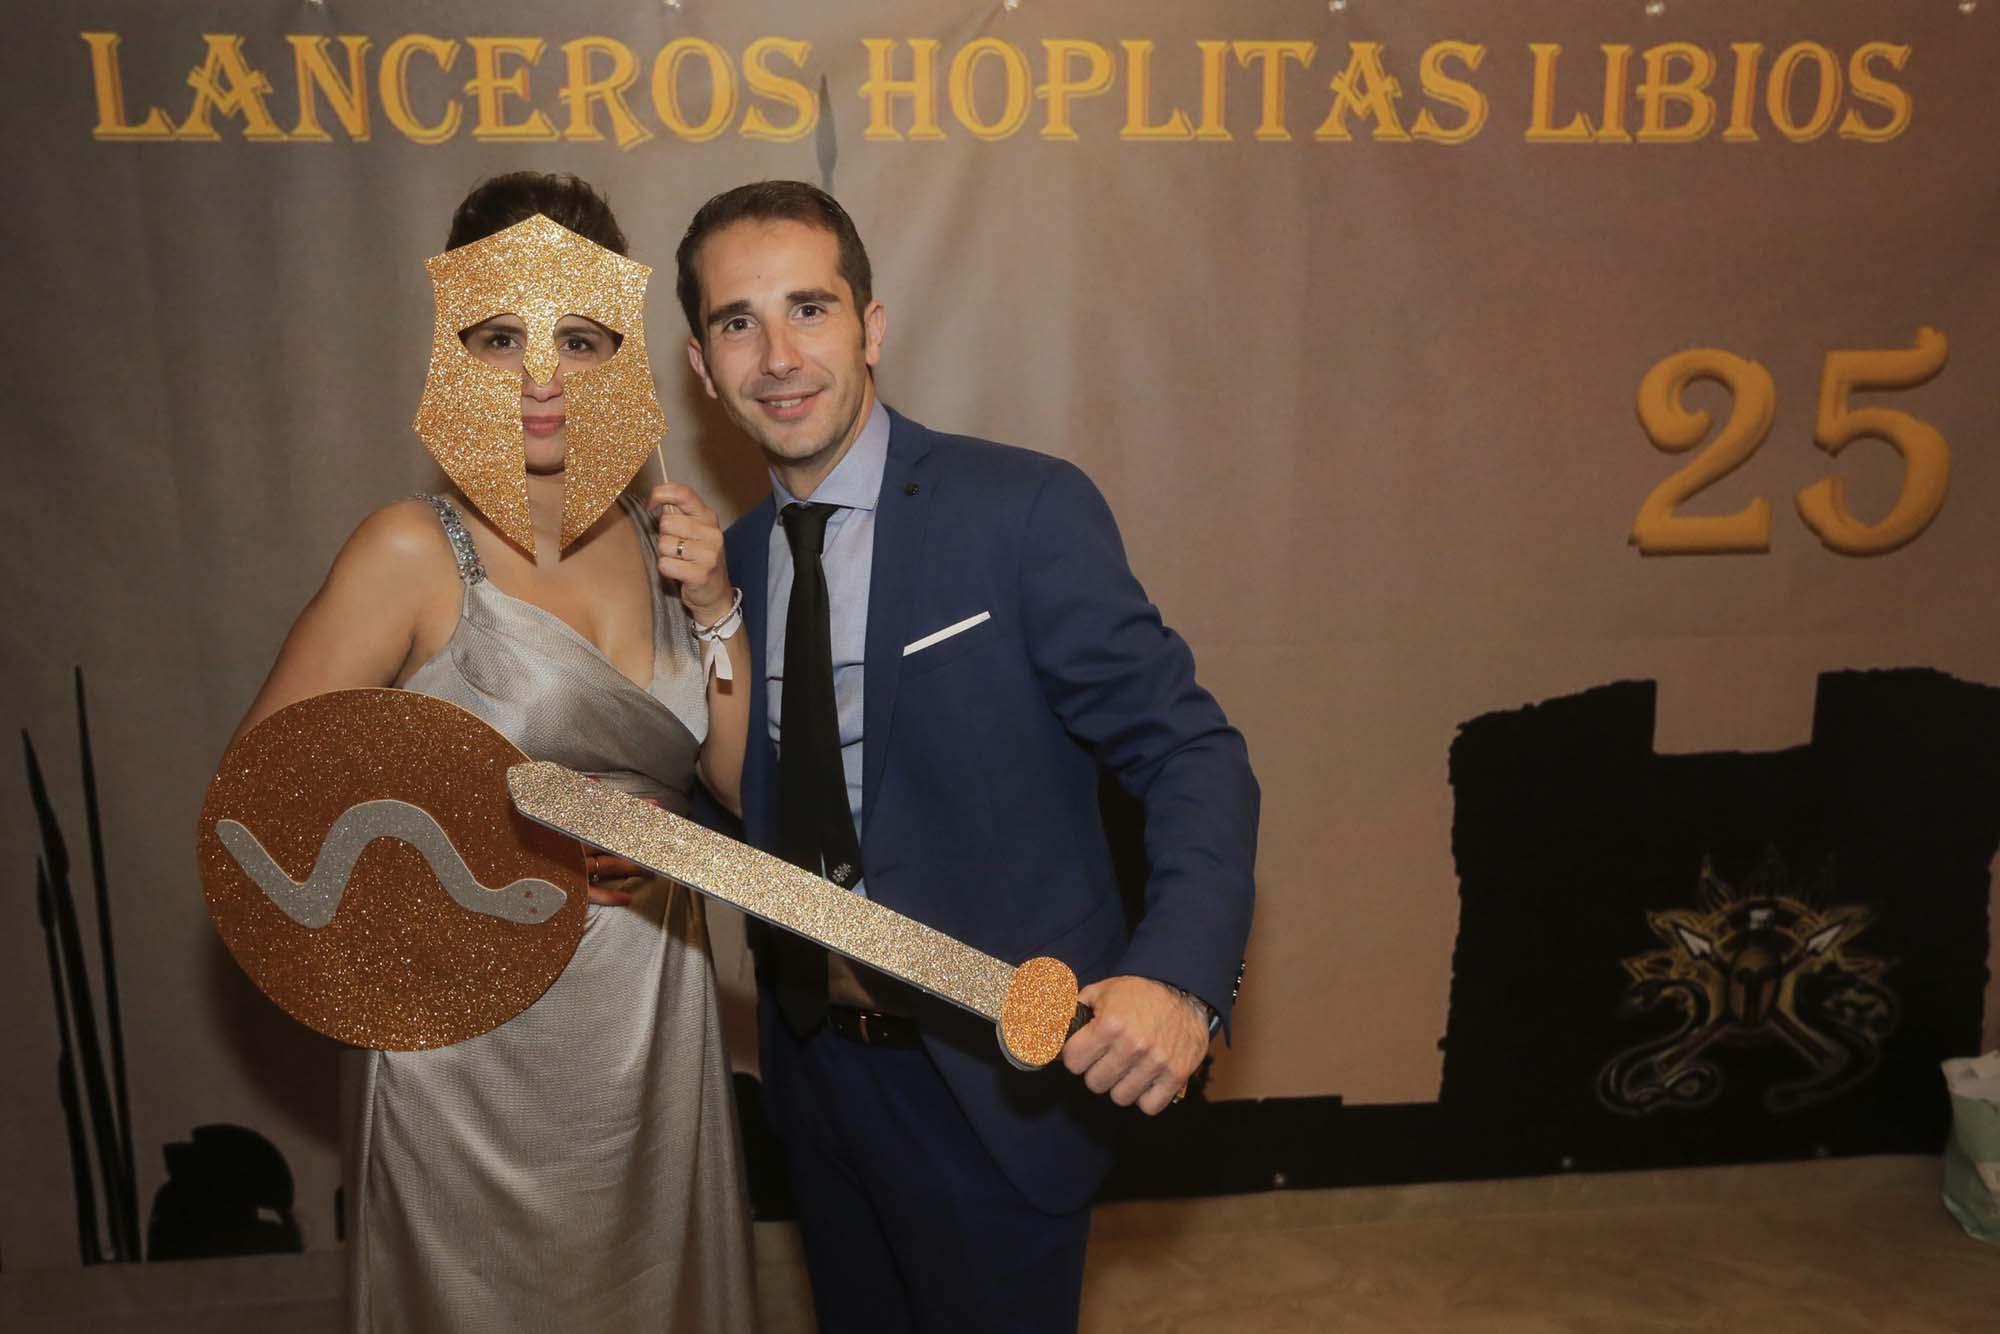 Lanceros Hoplitas Libios  (219)